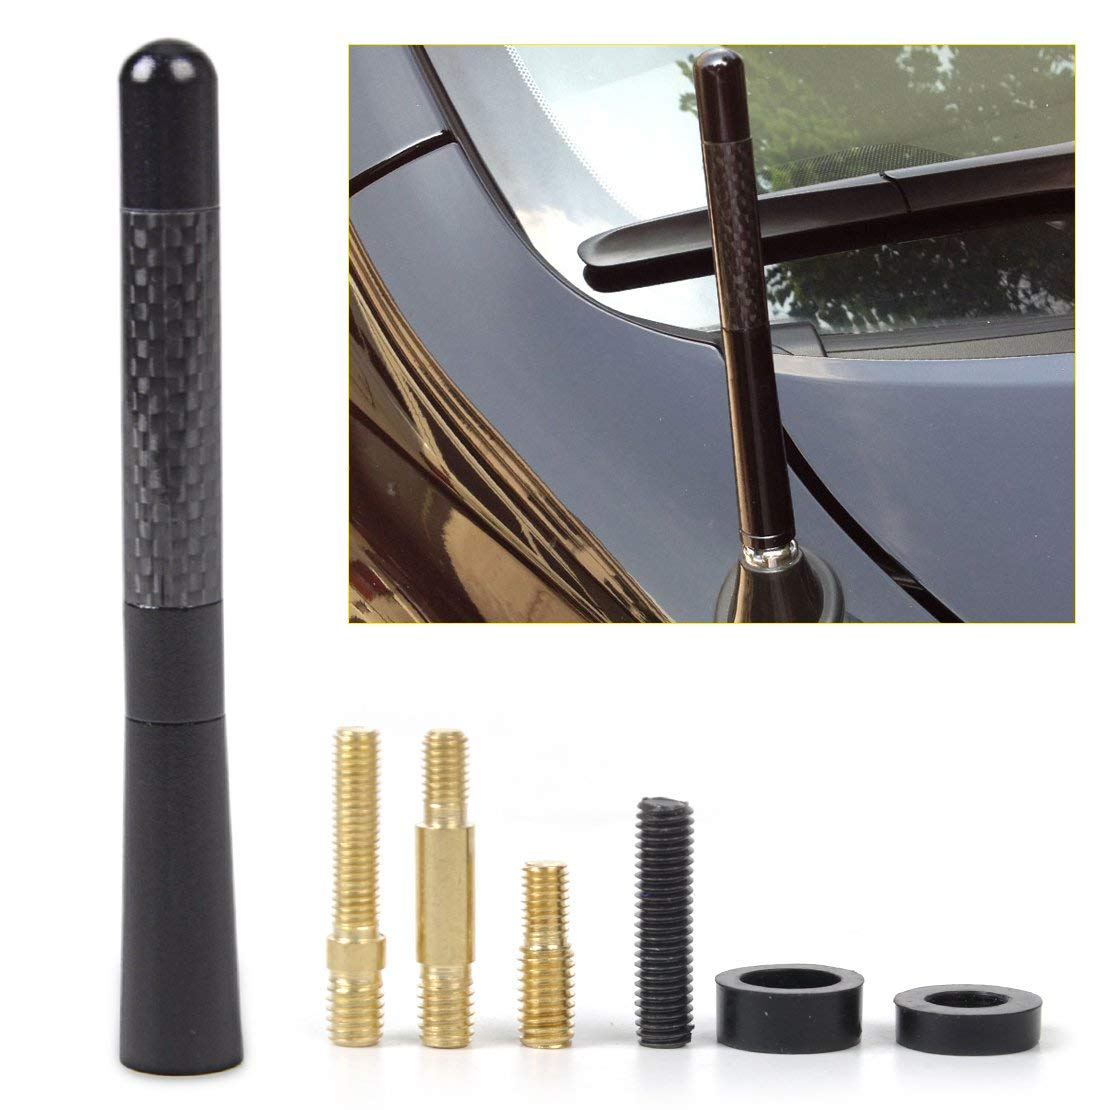 Screw New 4.7inch Universal Car Antenna Carbon Fiber Radio FM Antena Black Kit